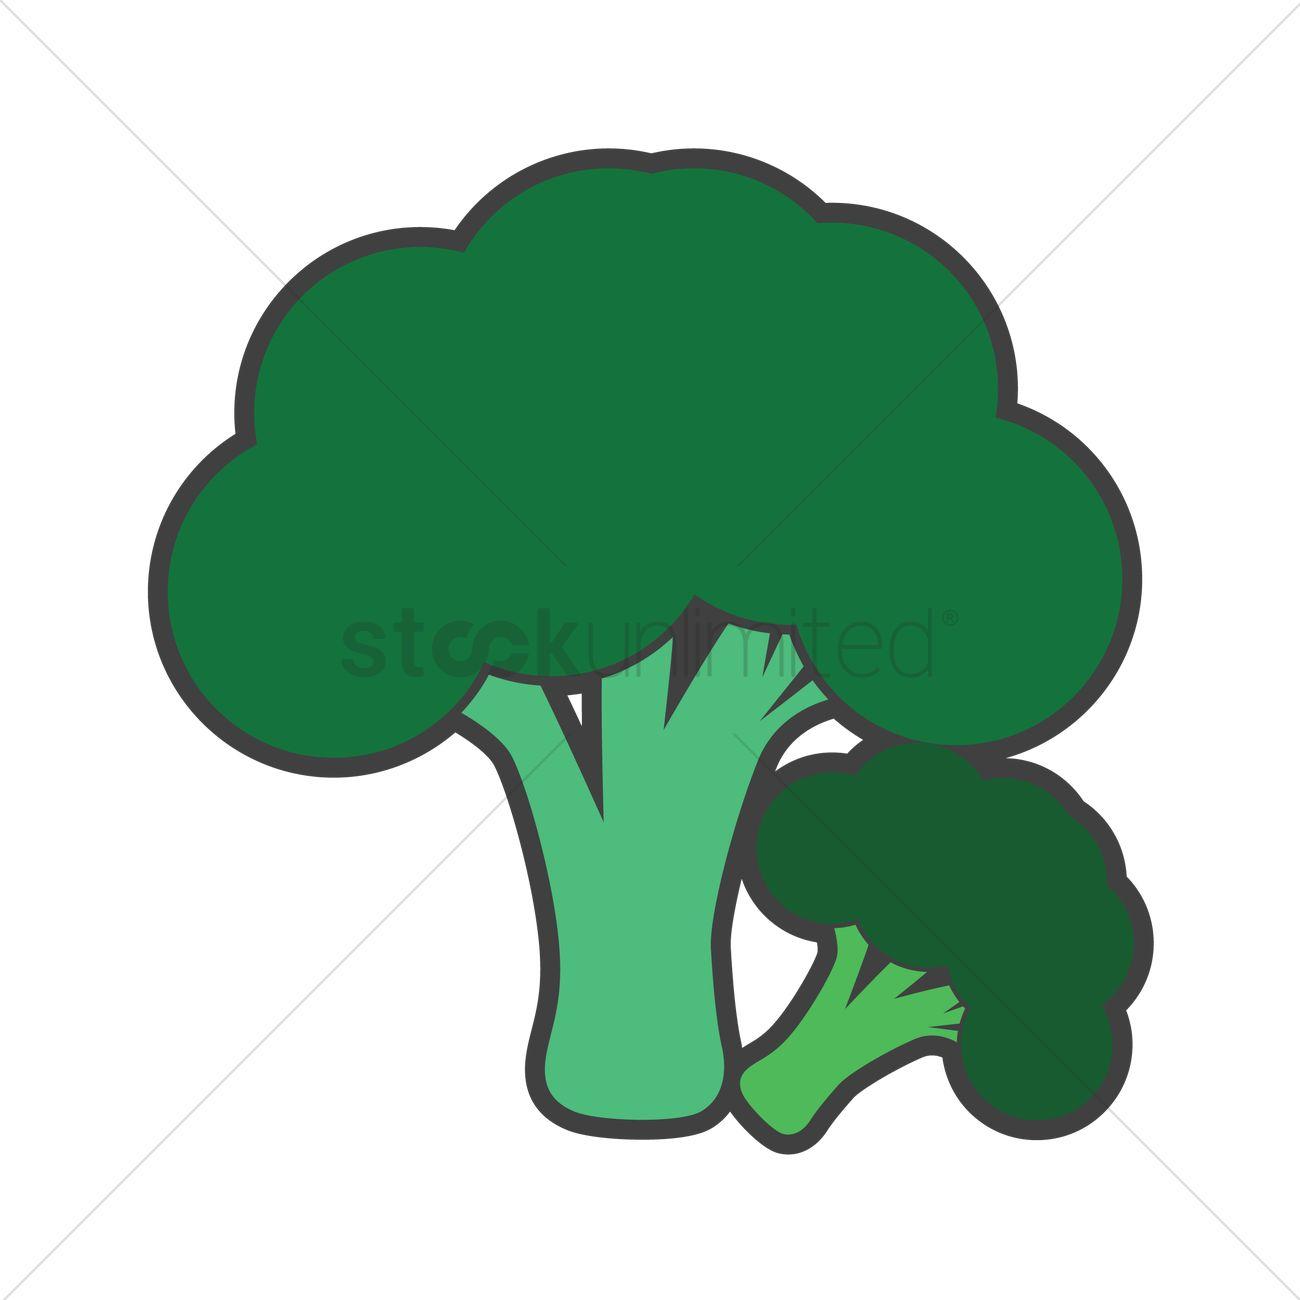 broccoli vector image 1272796 stockunlimited broccoli vector image 1272796